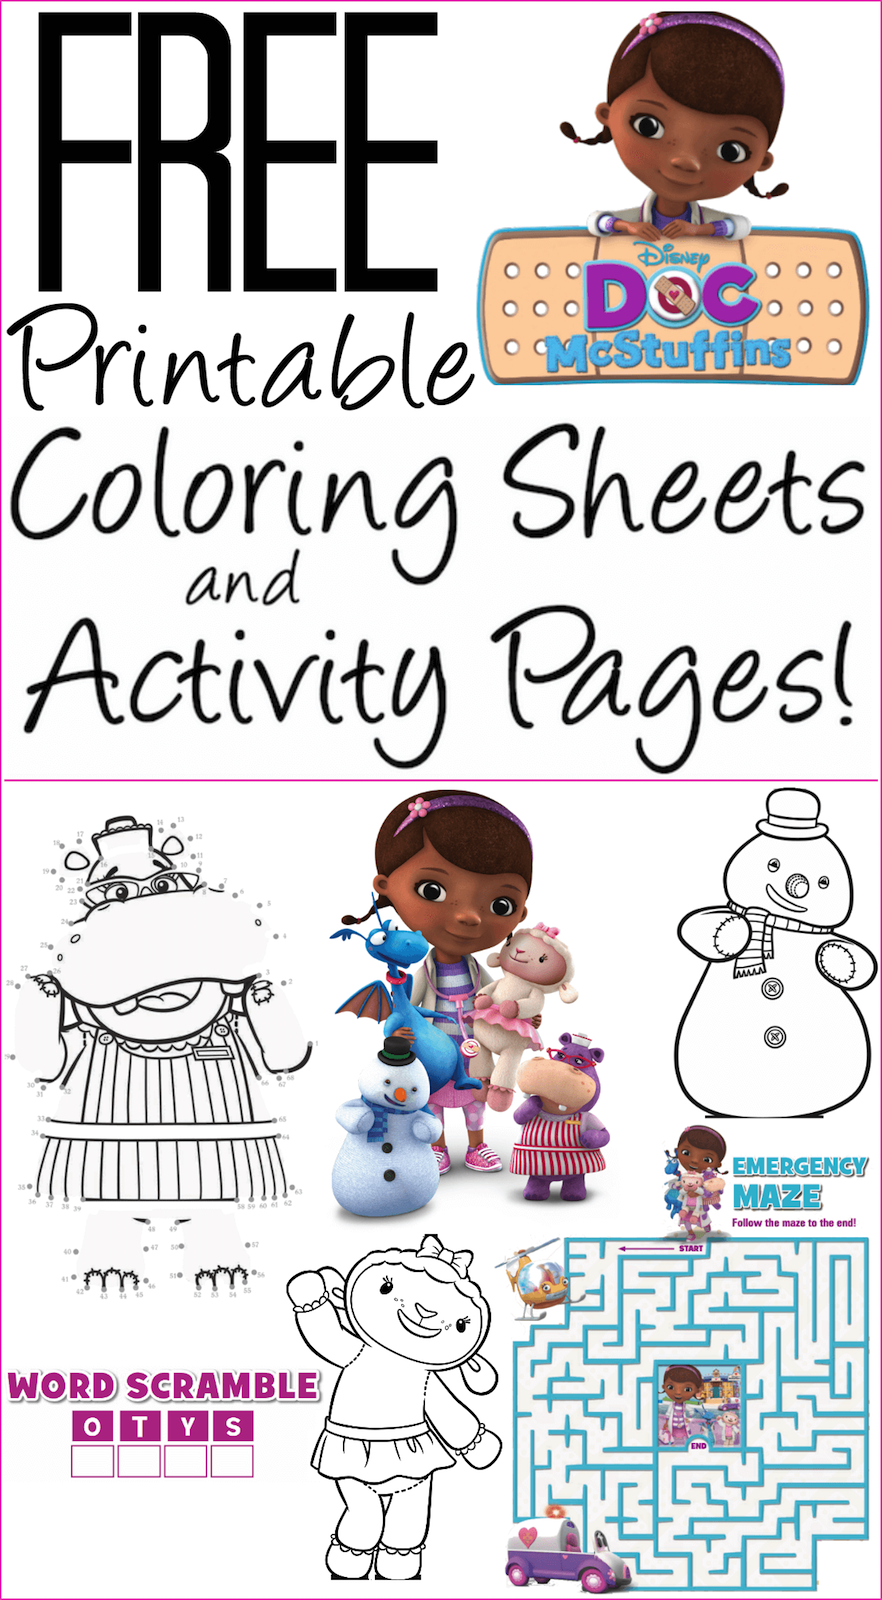 Free Doc McStuffins Coloring Pages, Activity Sheets: Print them Now!